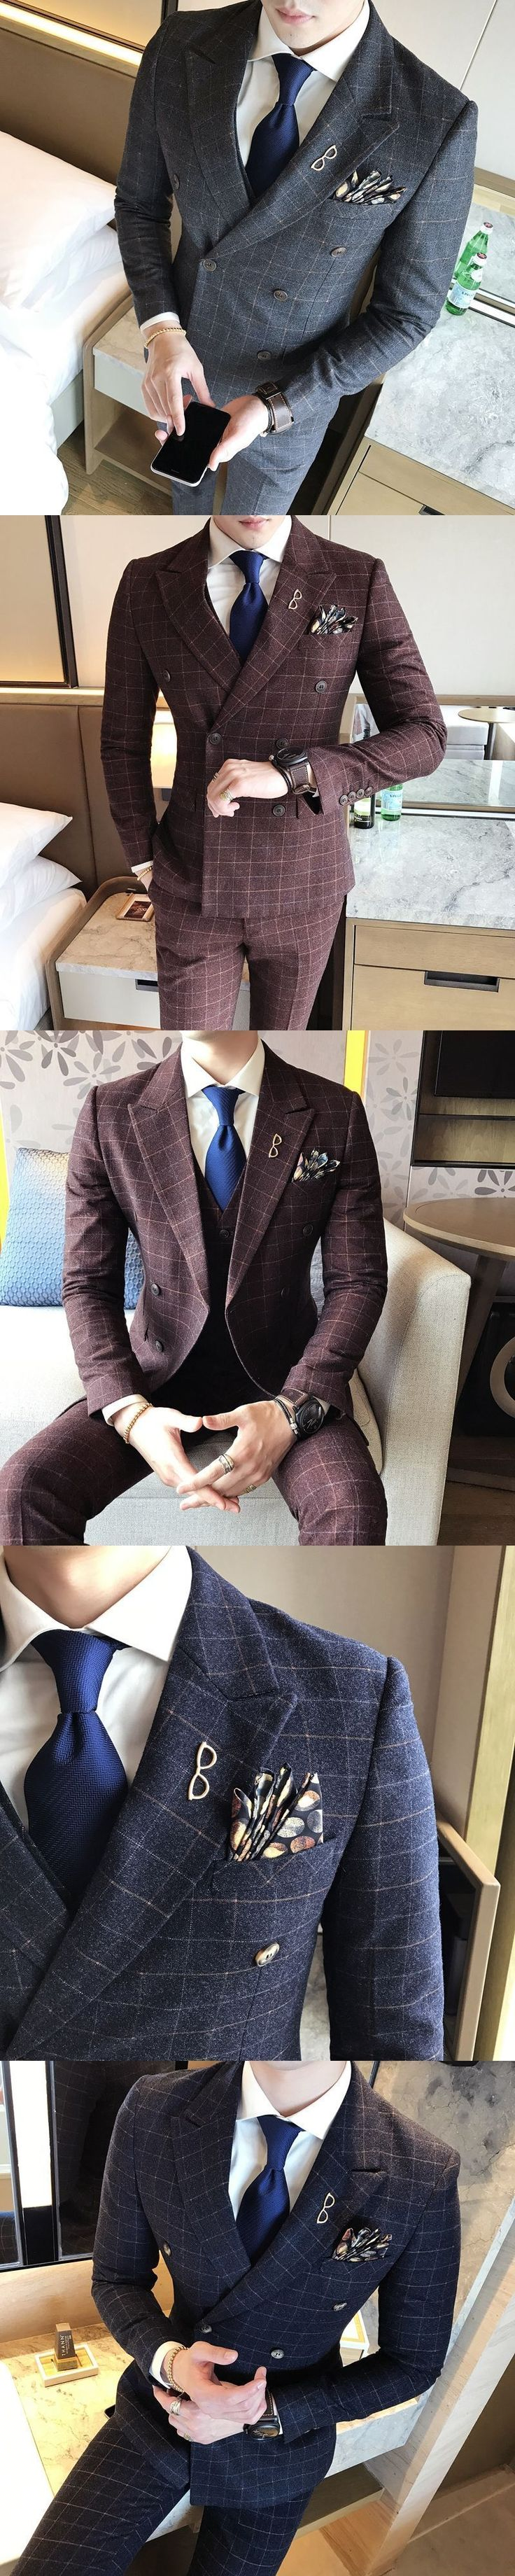 2017 Blue Wedding Suits For Mens Formal Vintage Plaid Suits Classic Mens Cotton Double Breasted Suits Mens Terno Azul Slim Fit #menssuitsvintage #menssuitsfit #men'sfitness